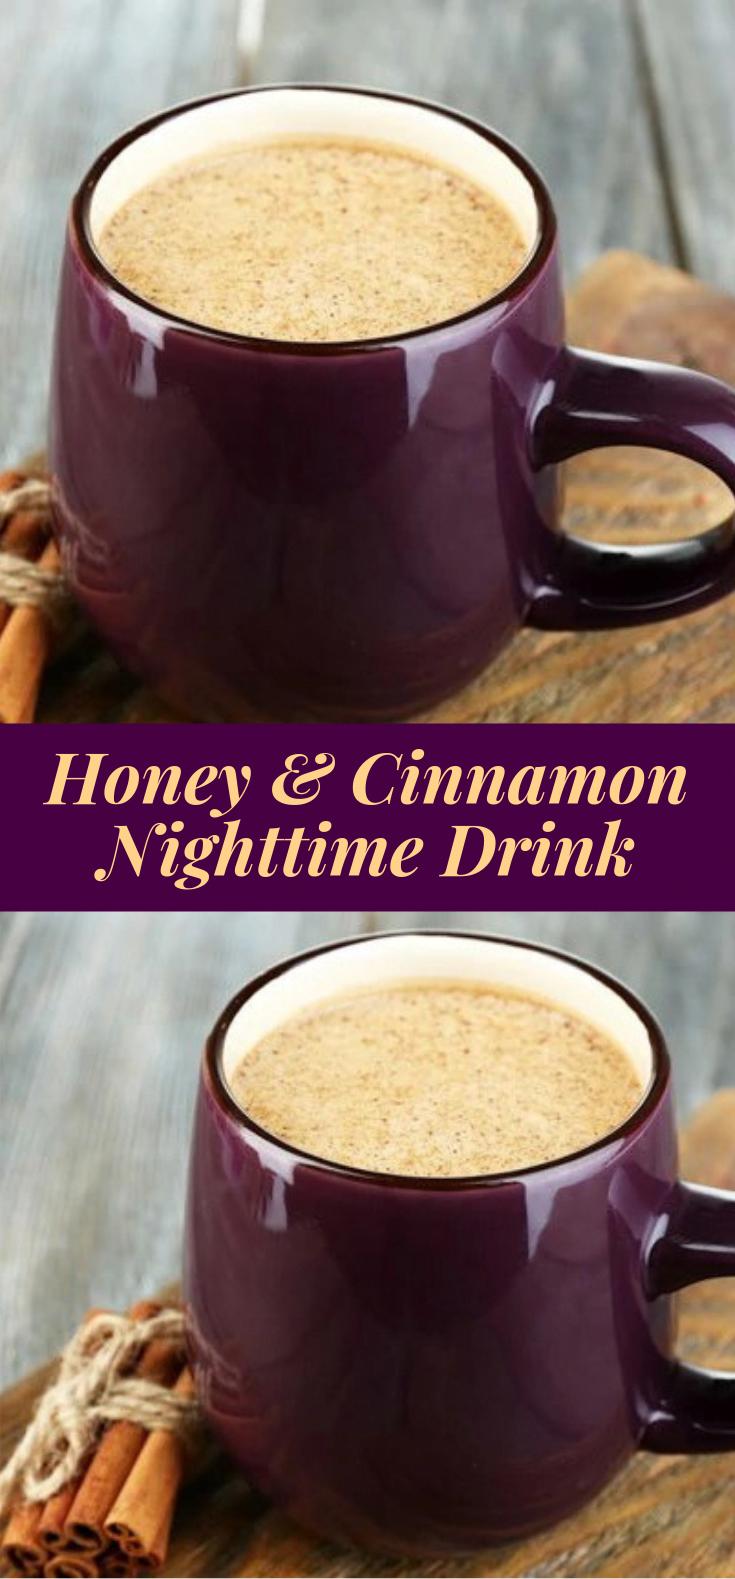 Honey and Cinnamon Nighttime Drink